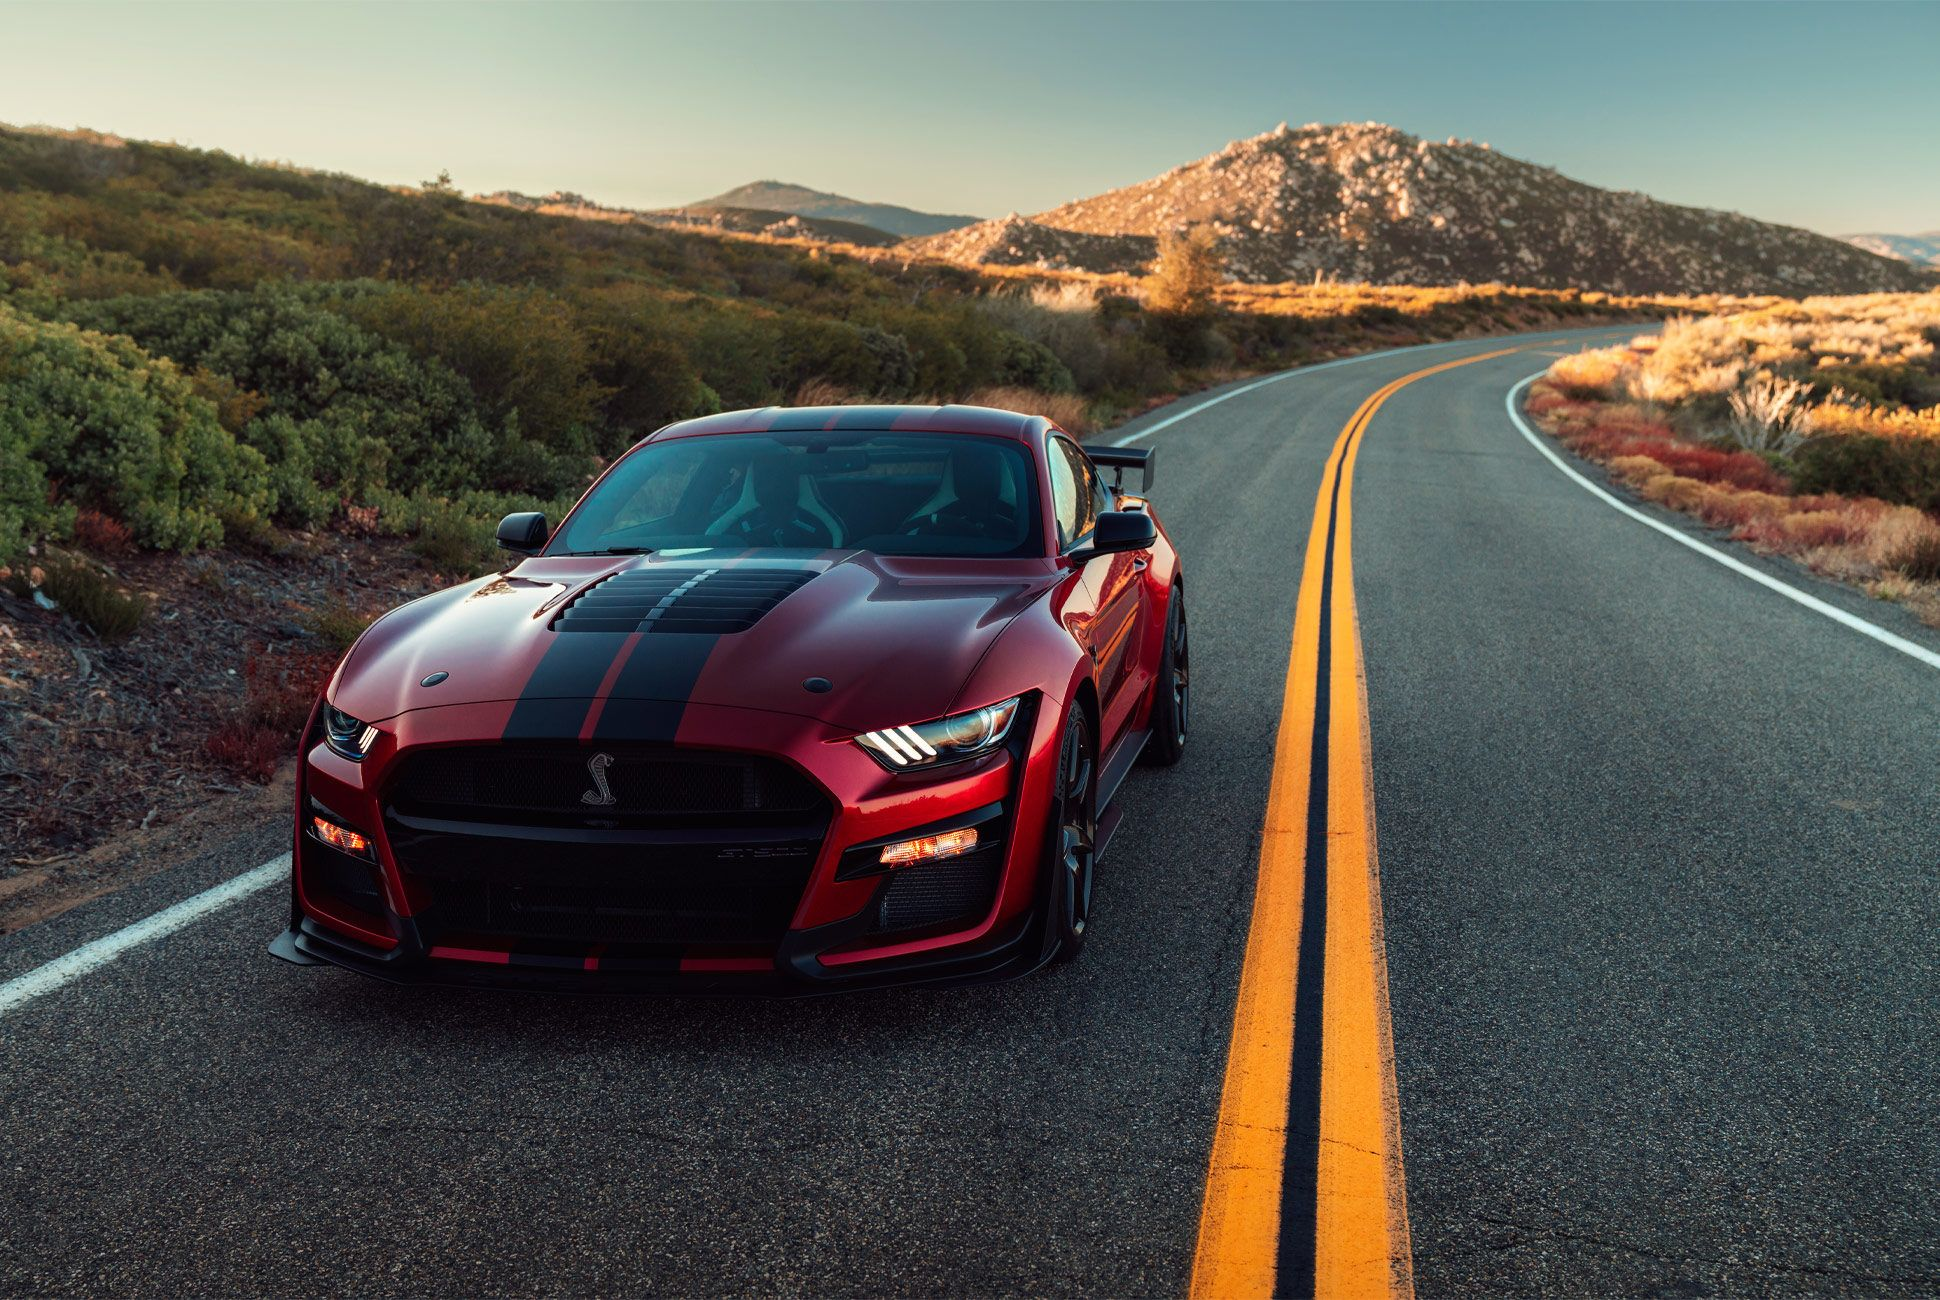 Mustang-GT500-Gear-Patrol-slide-1